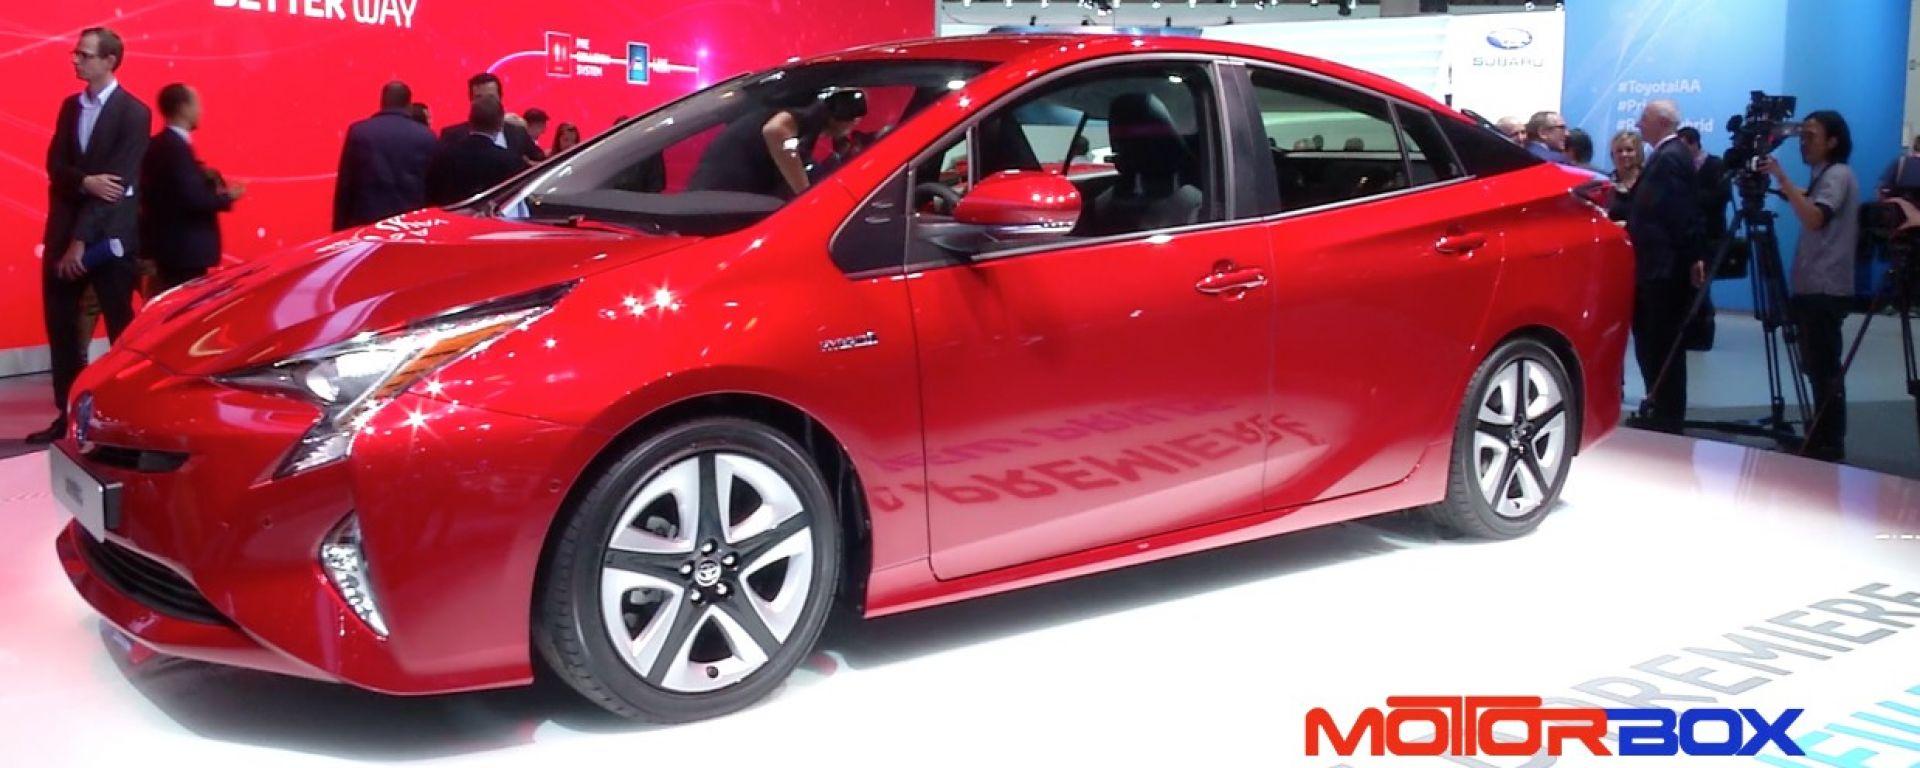 IAA Francoforte 2015: le novità Toyota